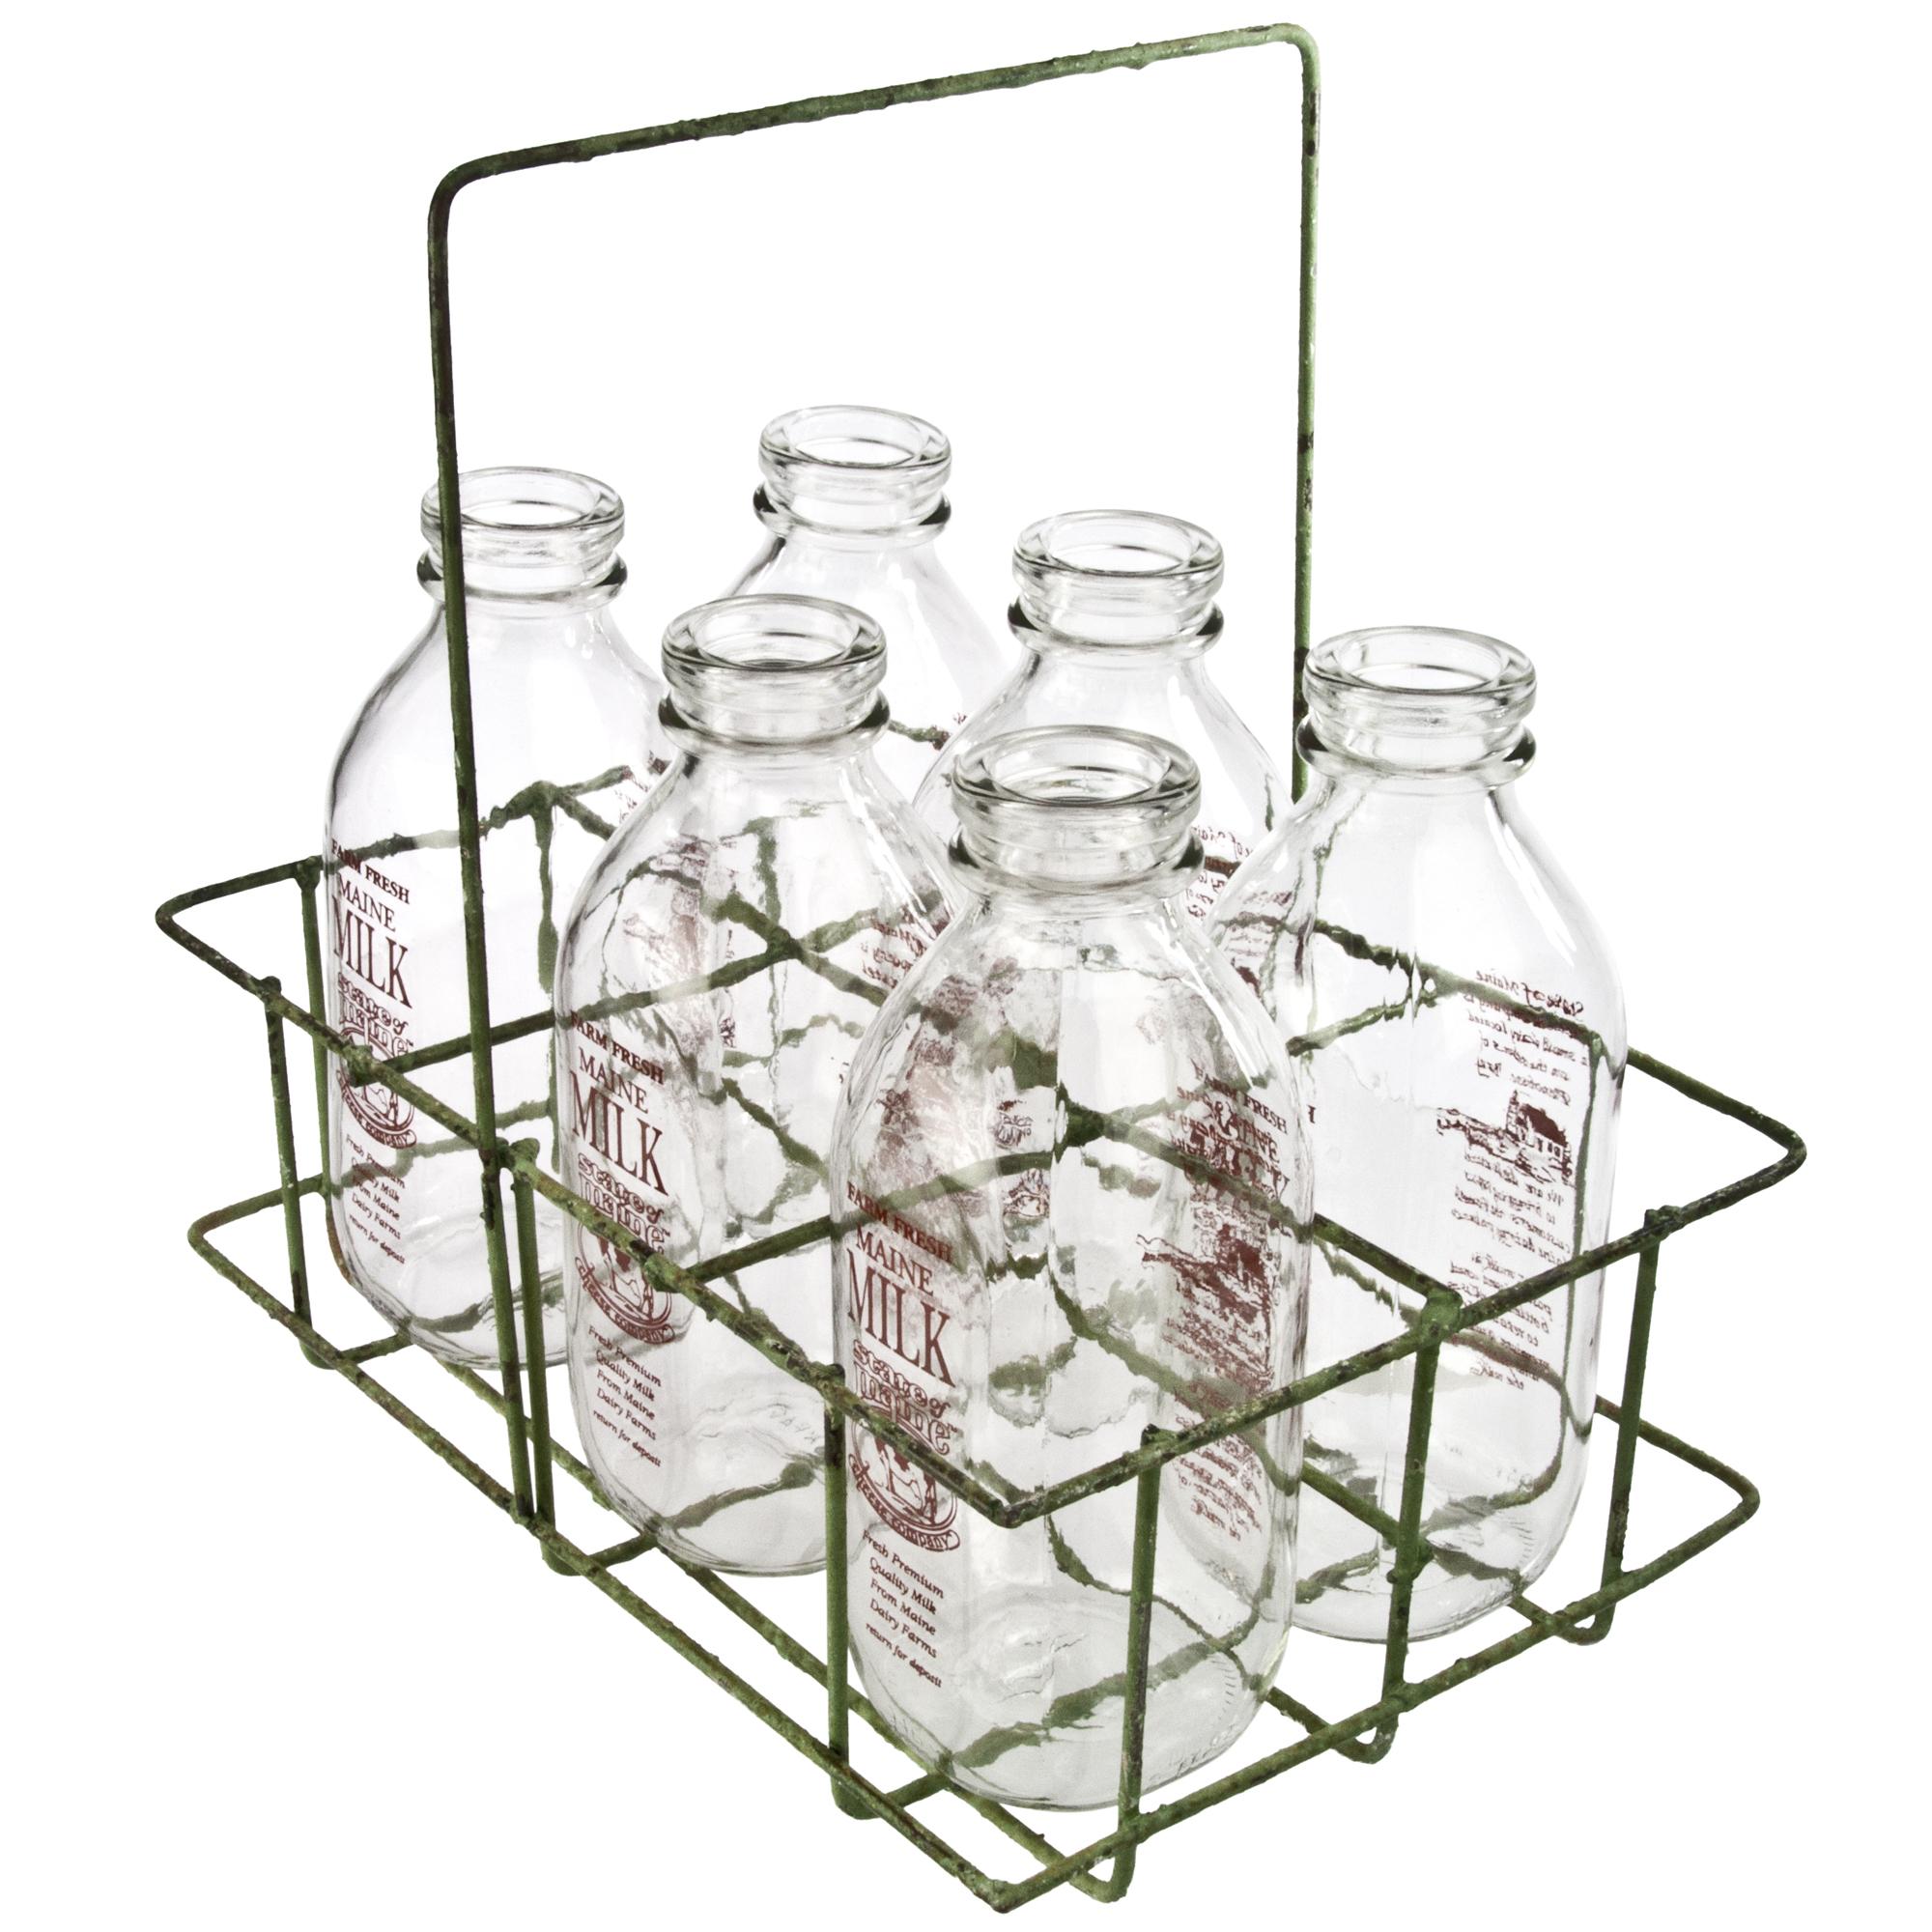 vintage wire milk bottle carrier bottles chairish. Black Bedroom Furniture Sets. Home Design Ideas